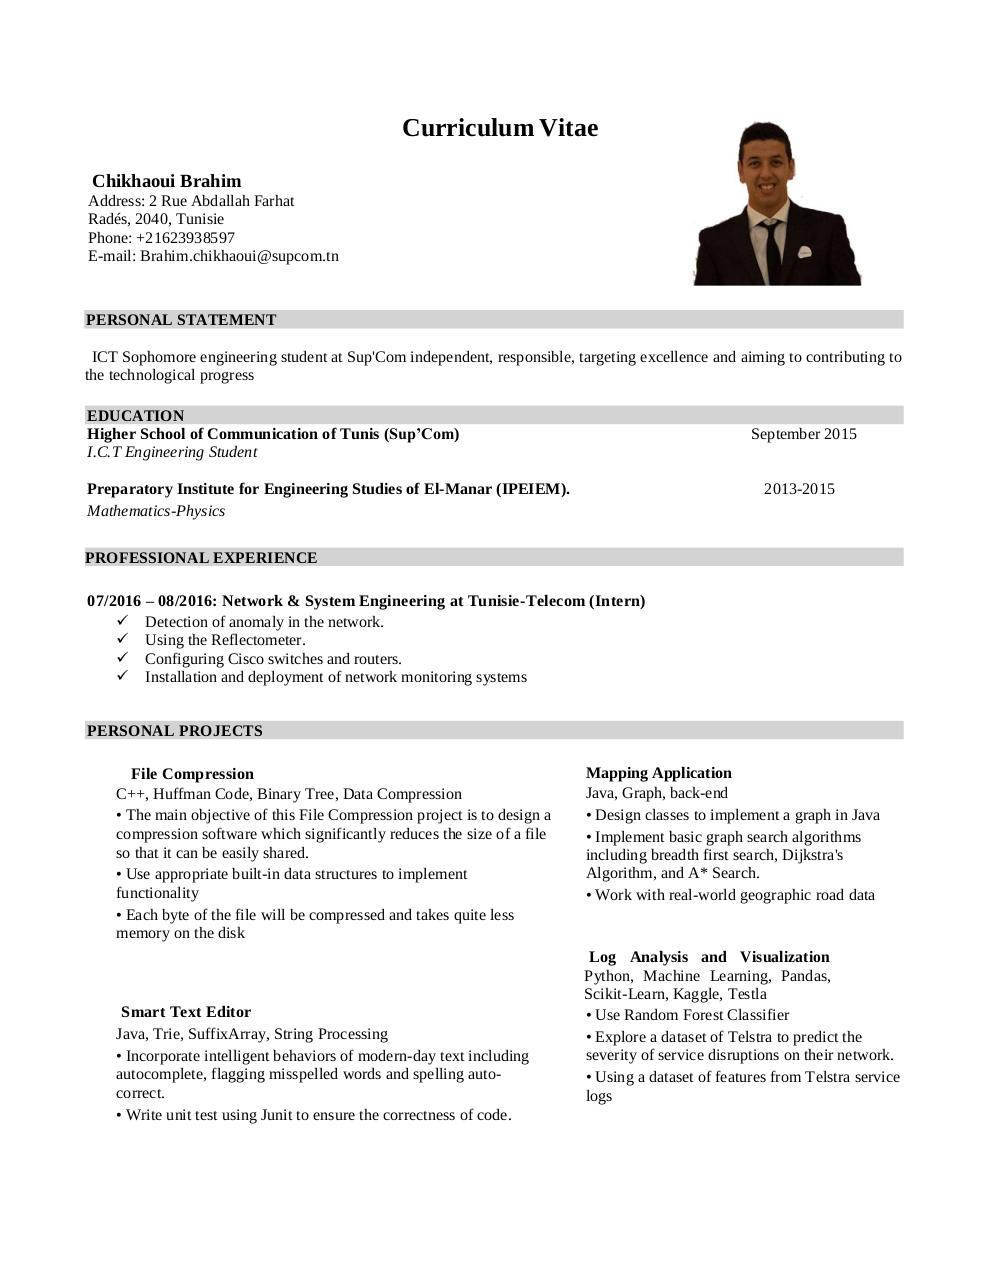 Curriculum Vitae Par Mohamed Fichier Pdf